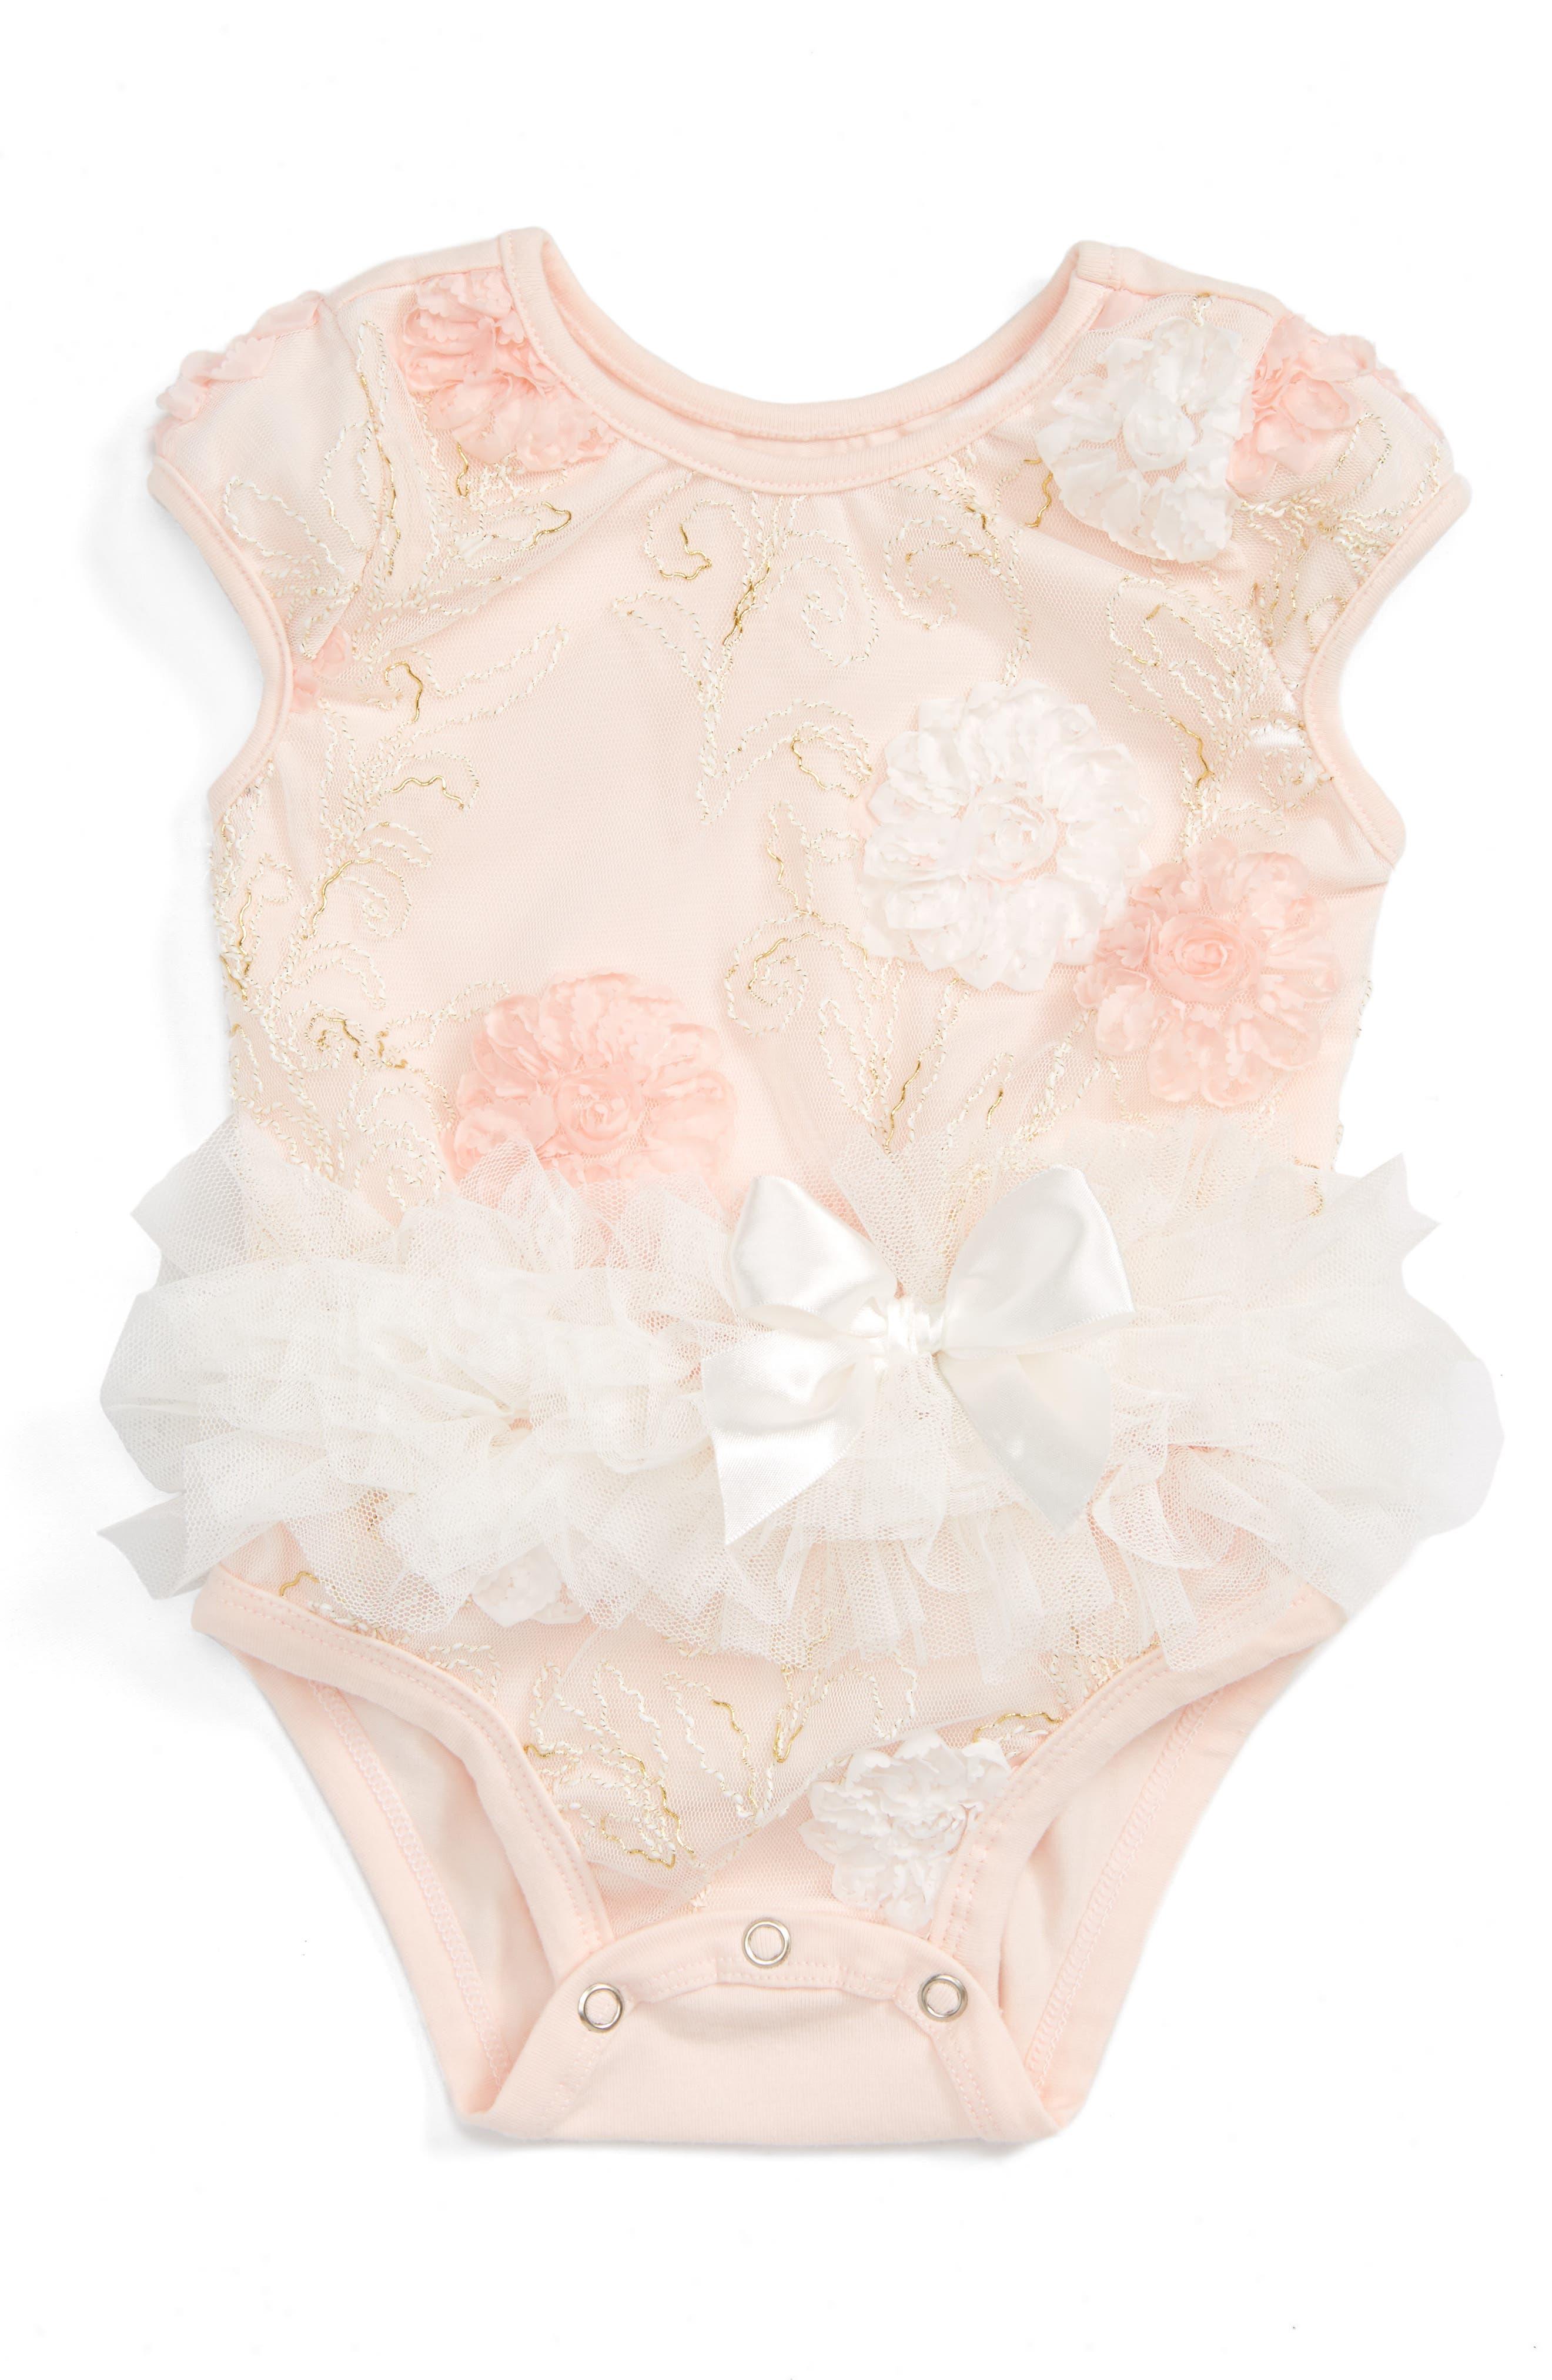 Alternate Image 1 Selected - Popatu Floral Tutu Bodysuit (Baby Girls)